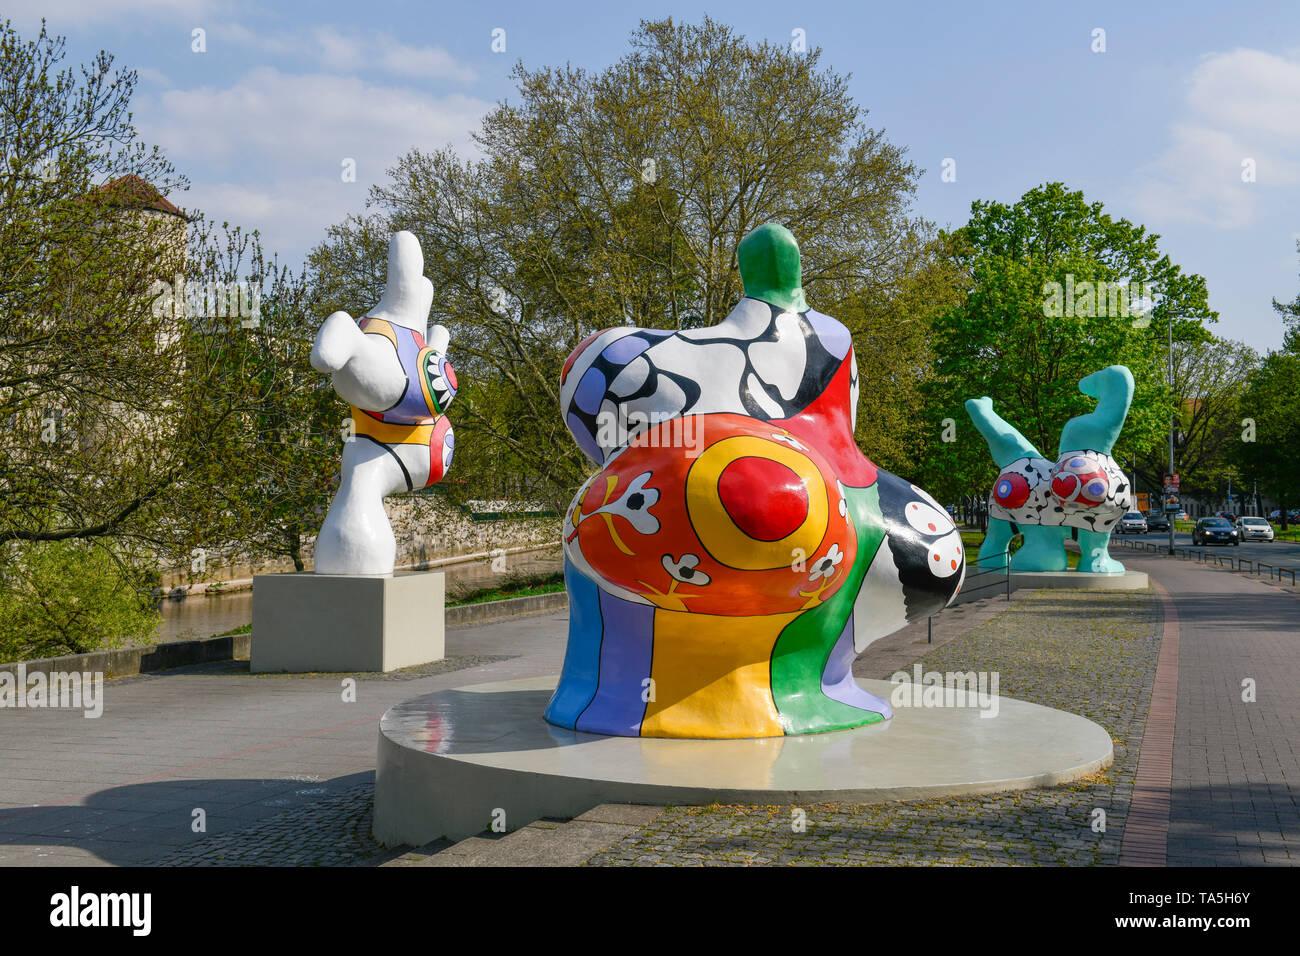 Nanas, plastics, Niki de Saint Phalle, Leibniz's shore, Hannover, Lower Saxony, Germany, Plastiken, Leibnizufer, Niedersachsen, Deutschland - Stock Image